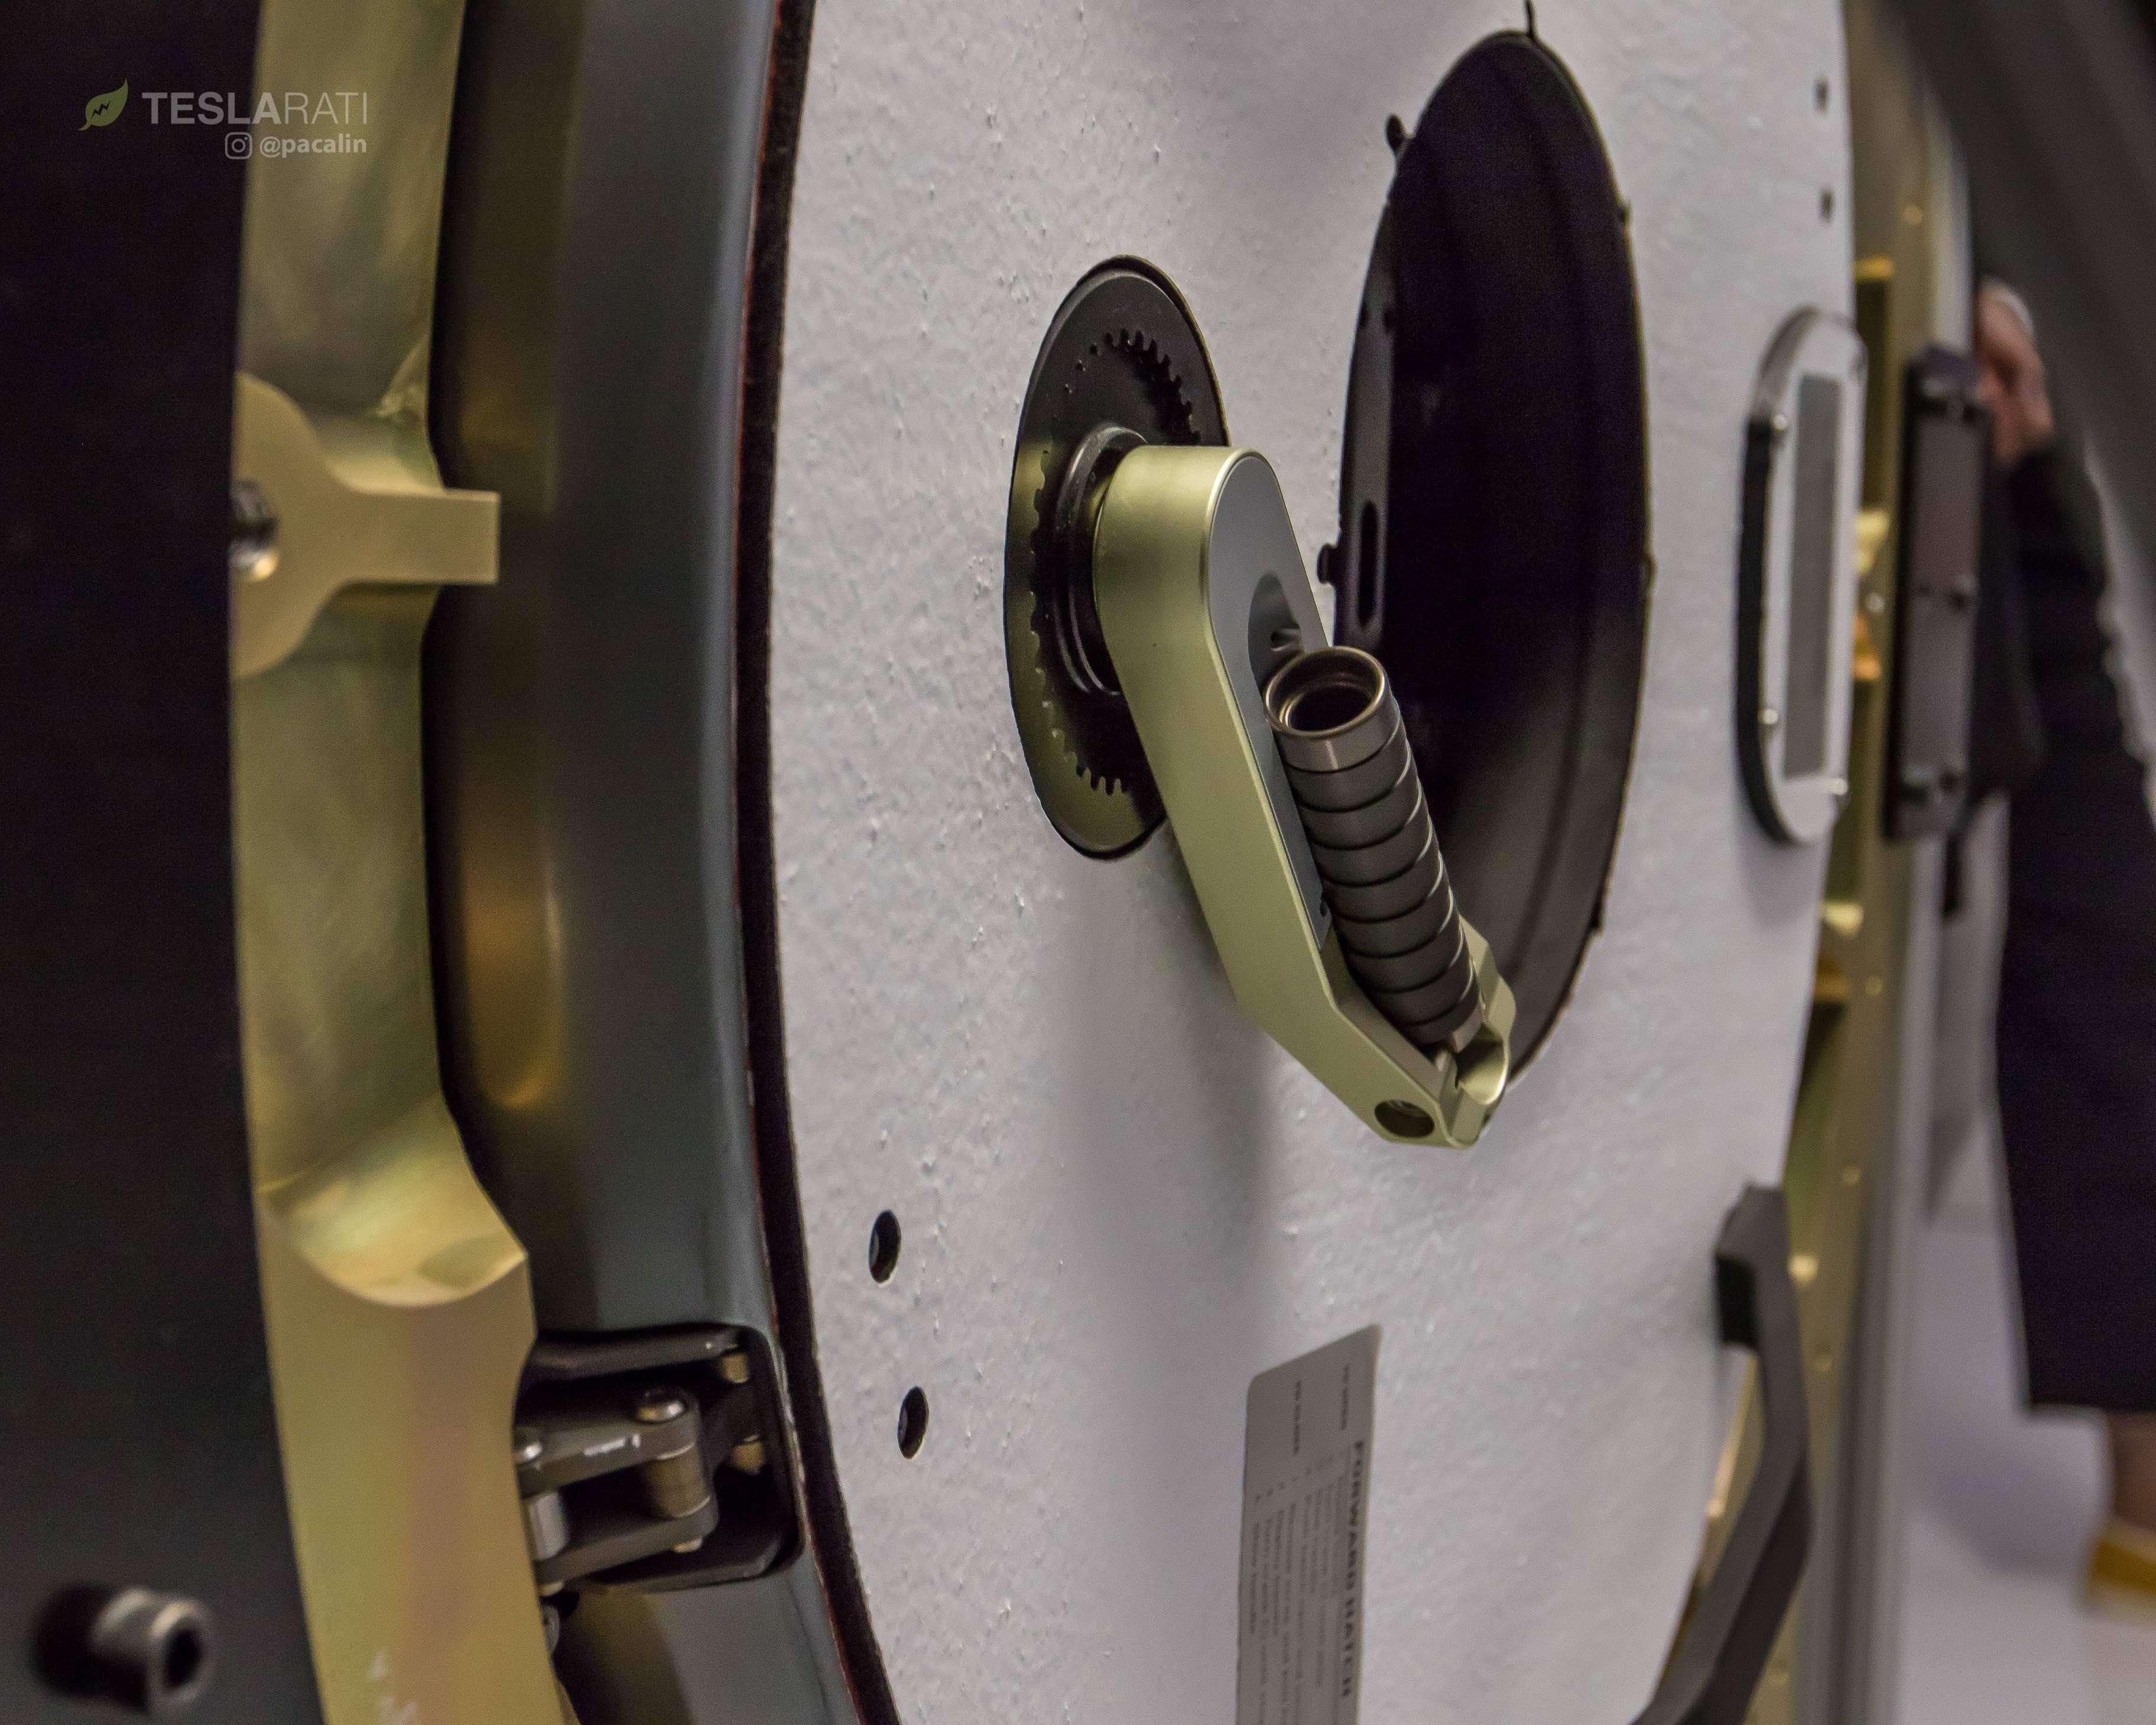 Crew Dragon simulator hatch 081318 (SpaceX) 3 (c)